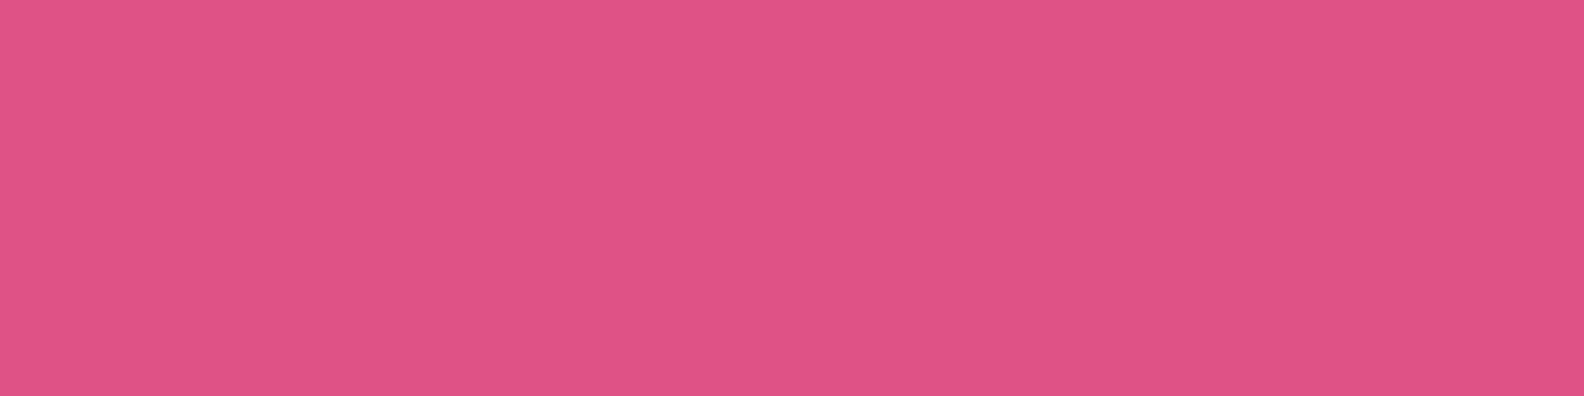 1584x396 Fandango Pink Solid Color Background